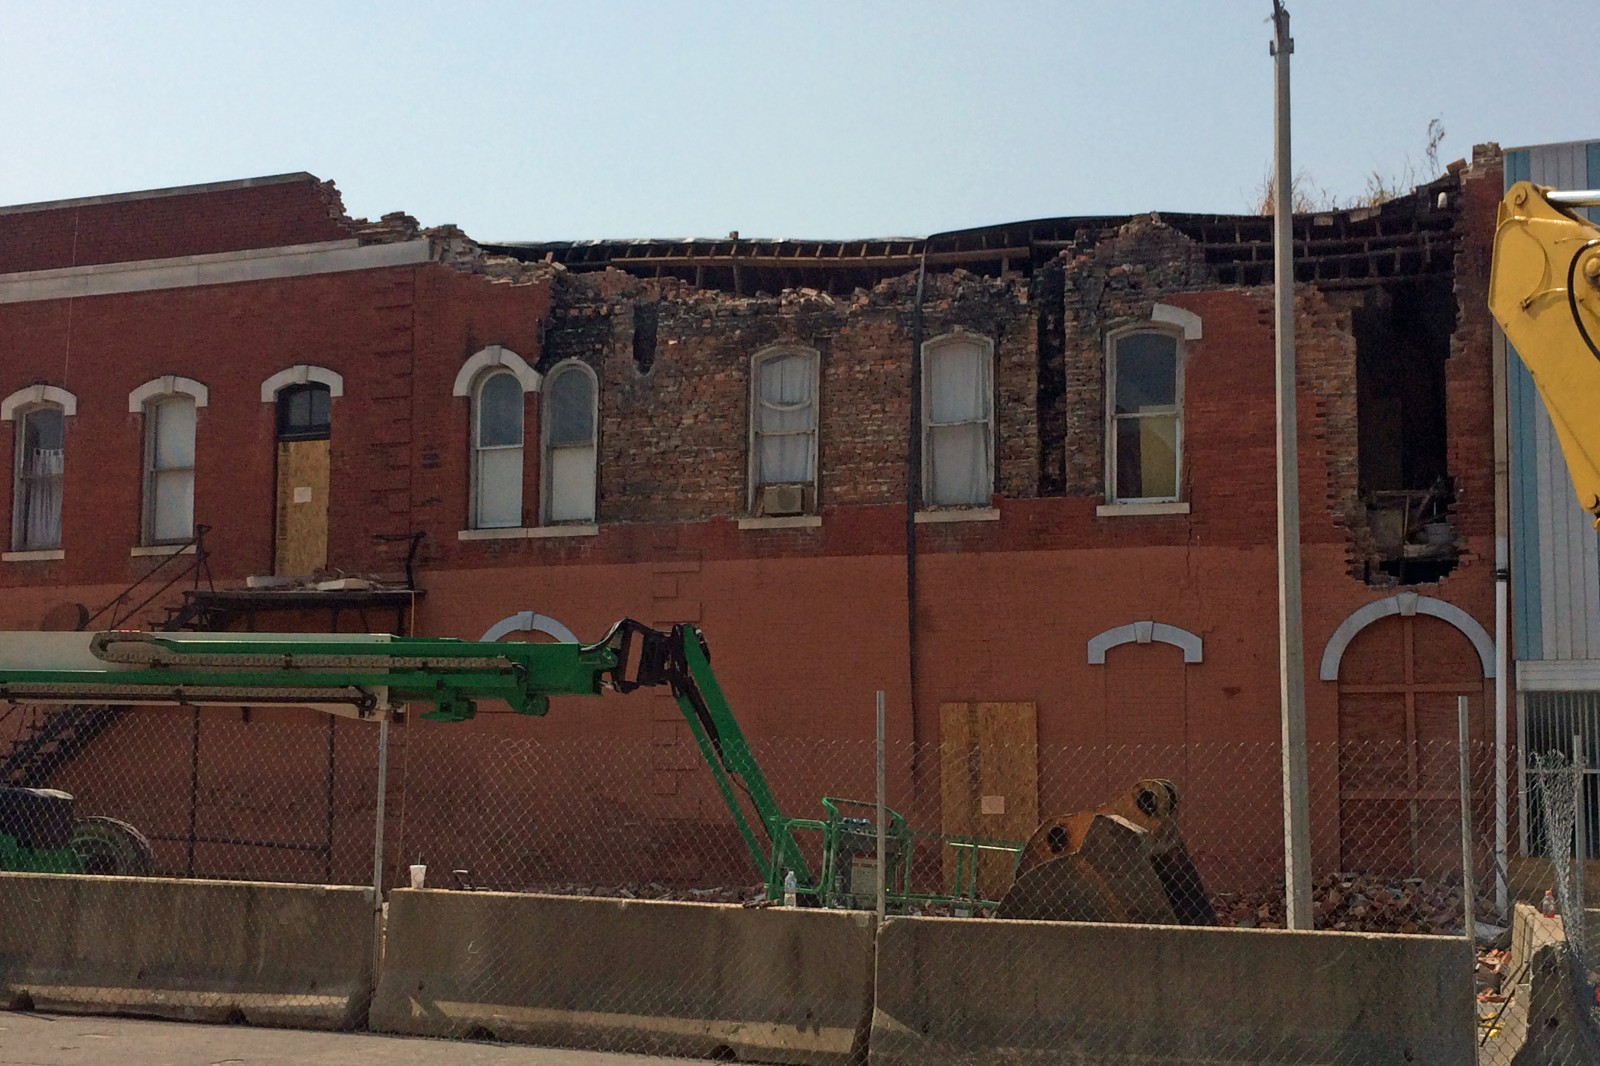 Demolition work progressing on downtown buildings